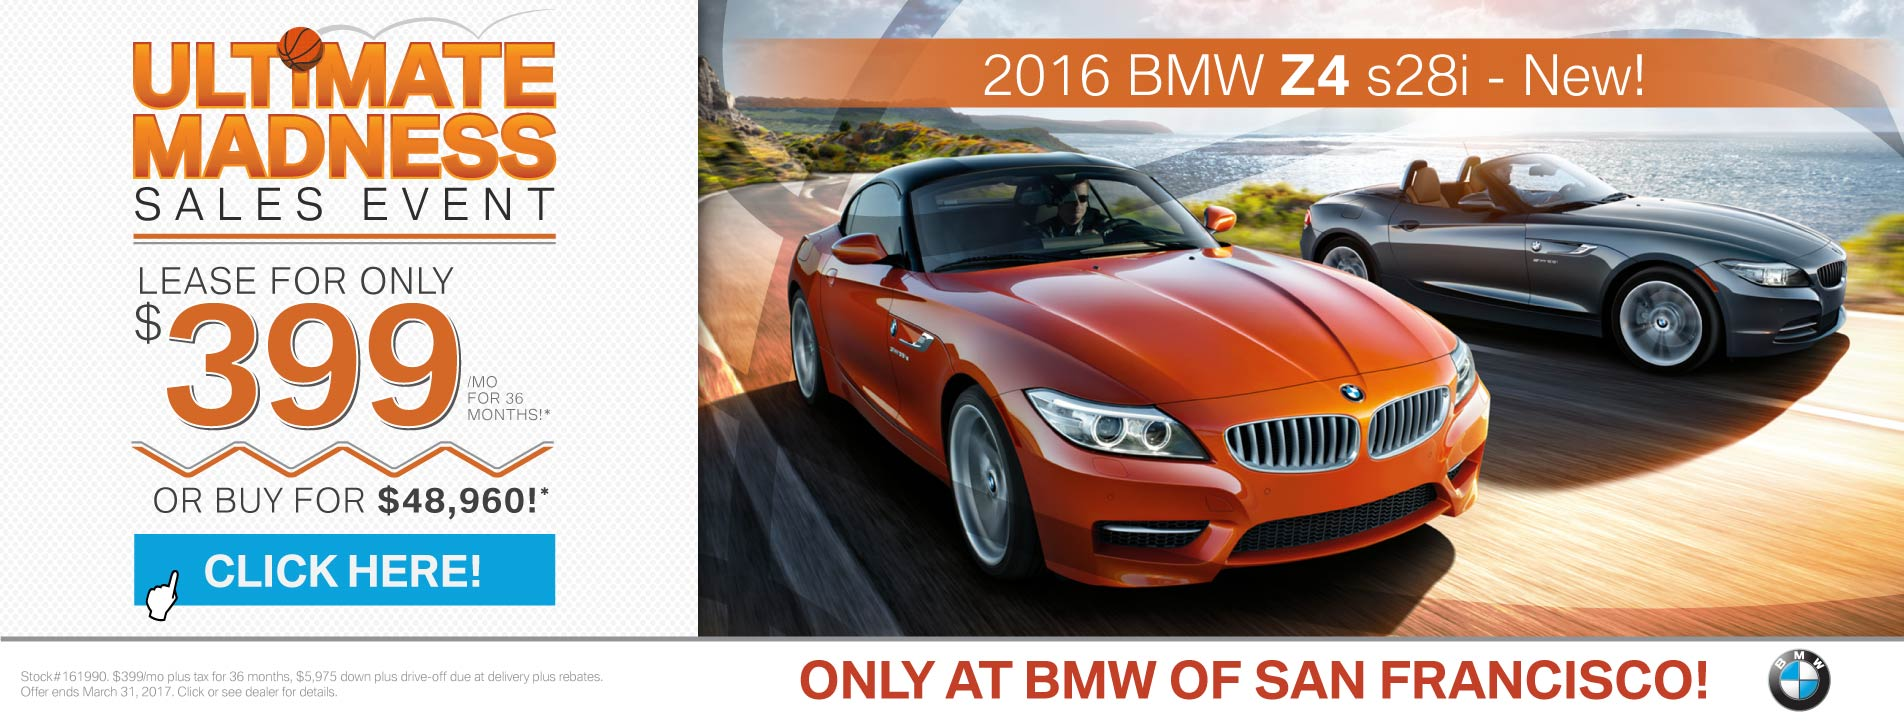 2017 BMW Z4 Offer